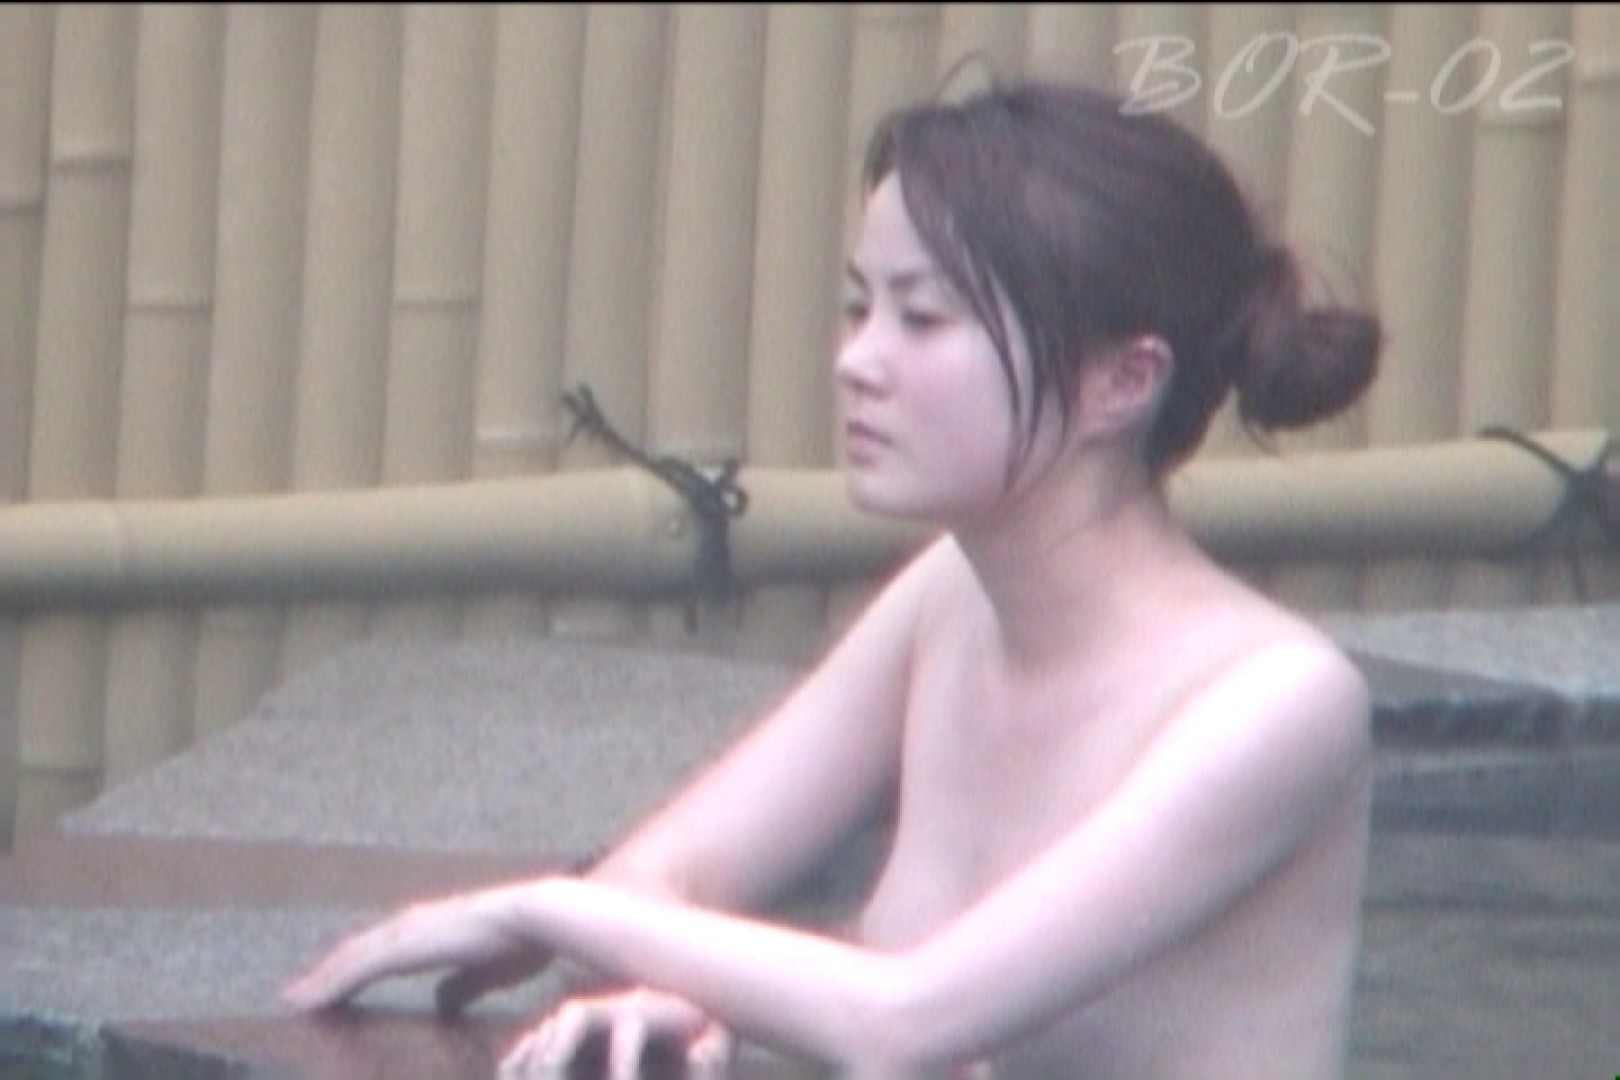 Aquaな露天風呂Vol.474 盗撮シリーズ | 露天風呂編  111PIX 53